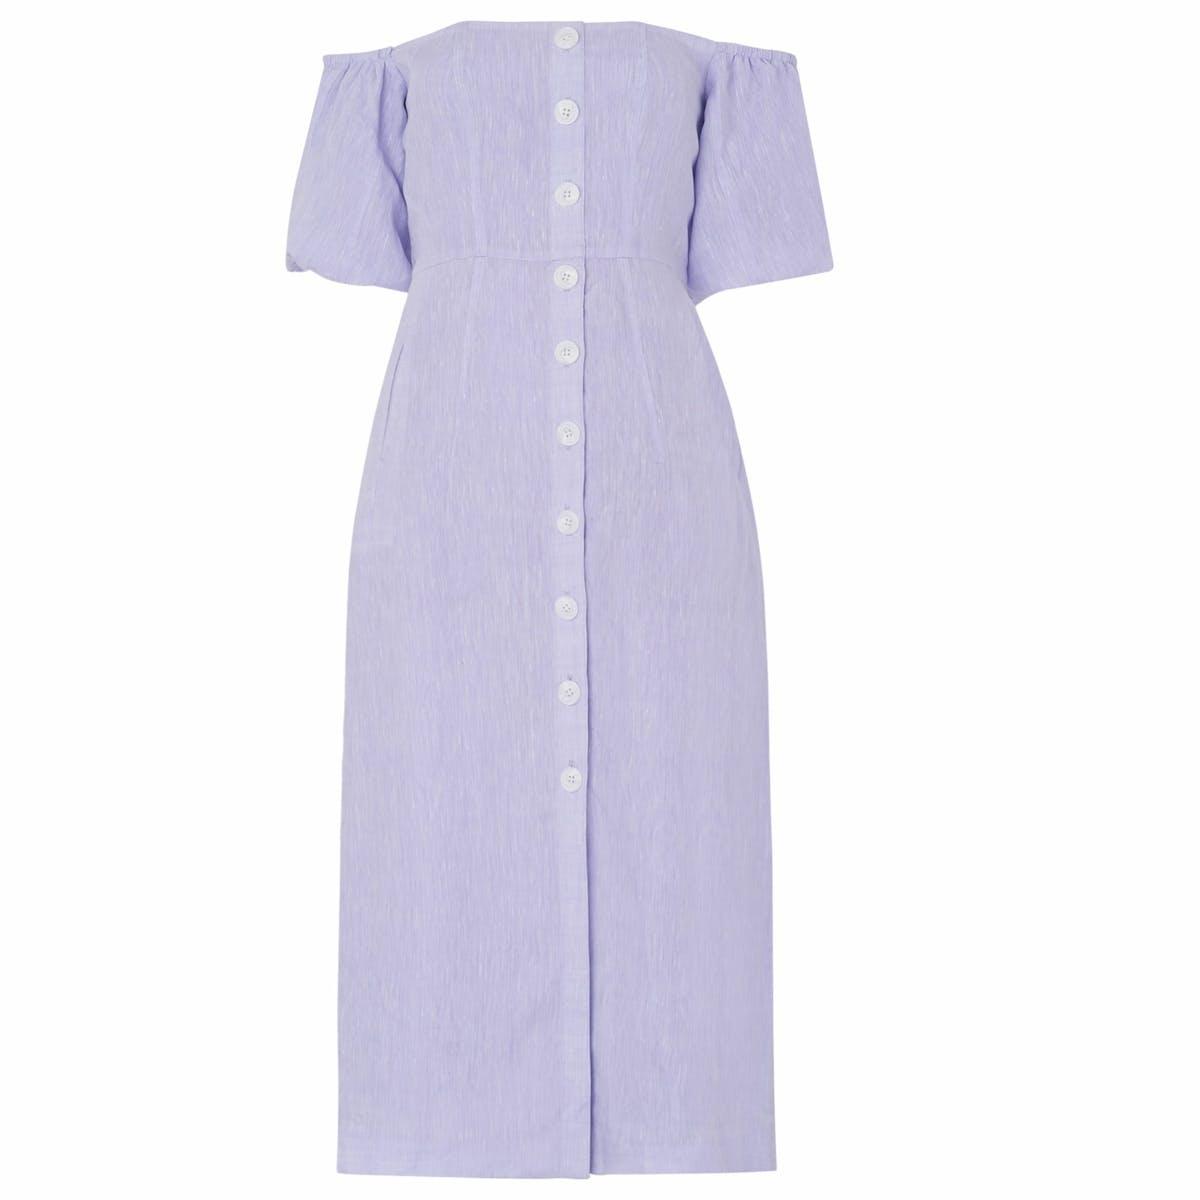 e6dbc8d8 Kitri Violette linen dress, £145, available at kitristudio.com in May